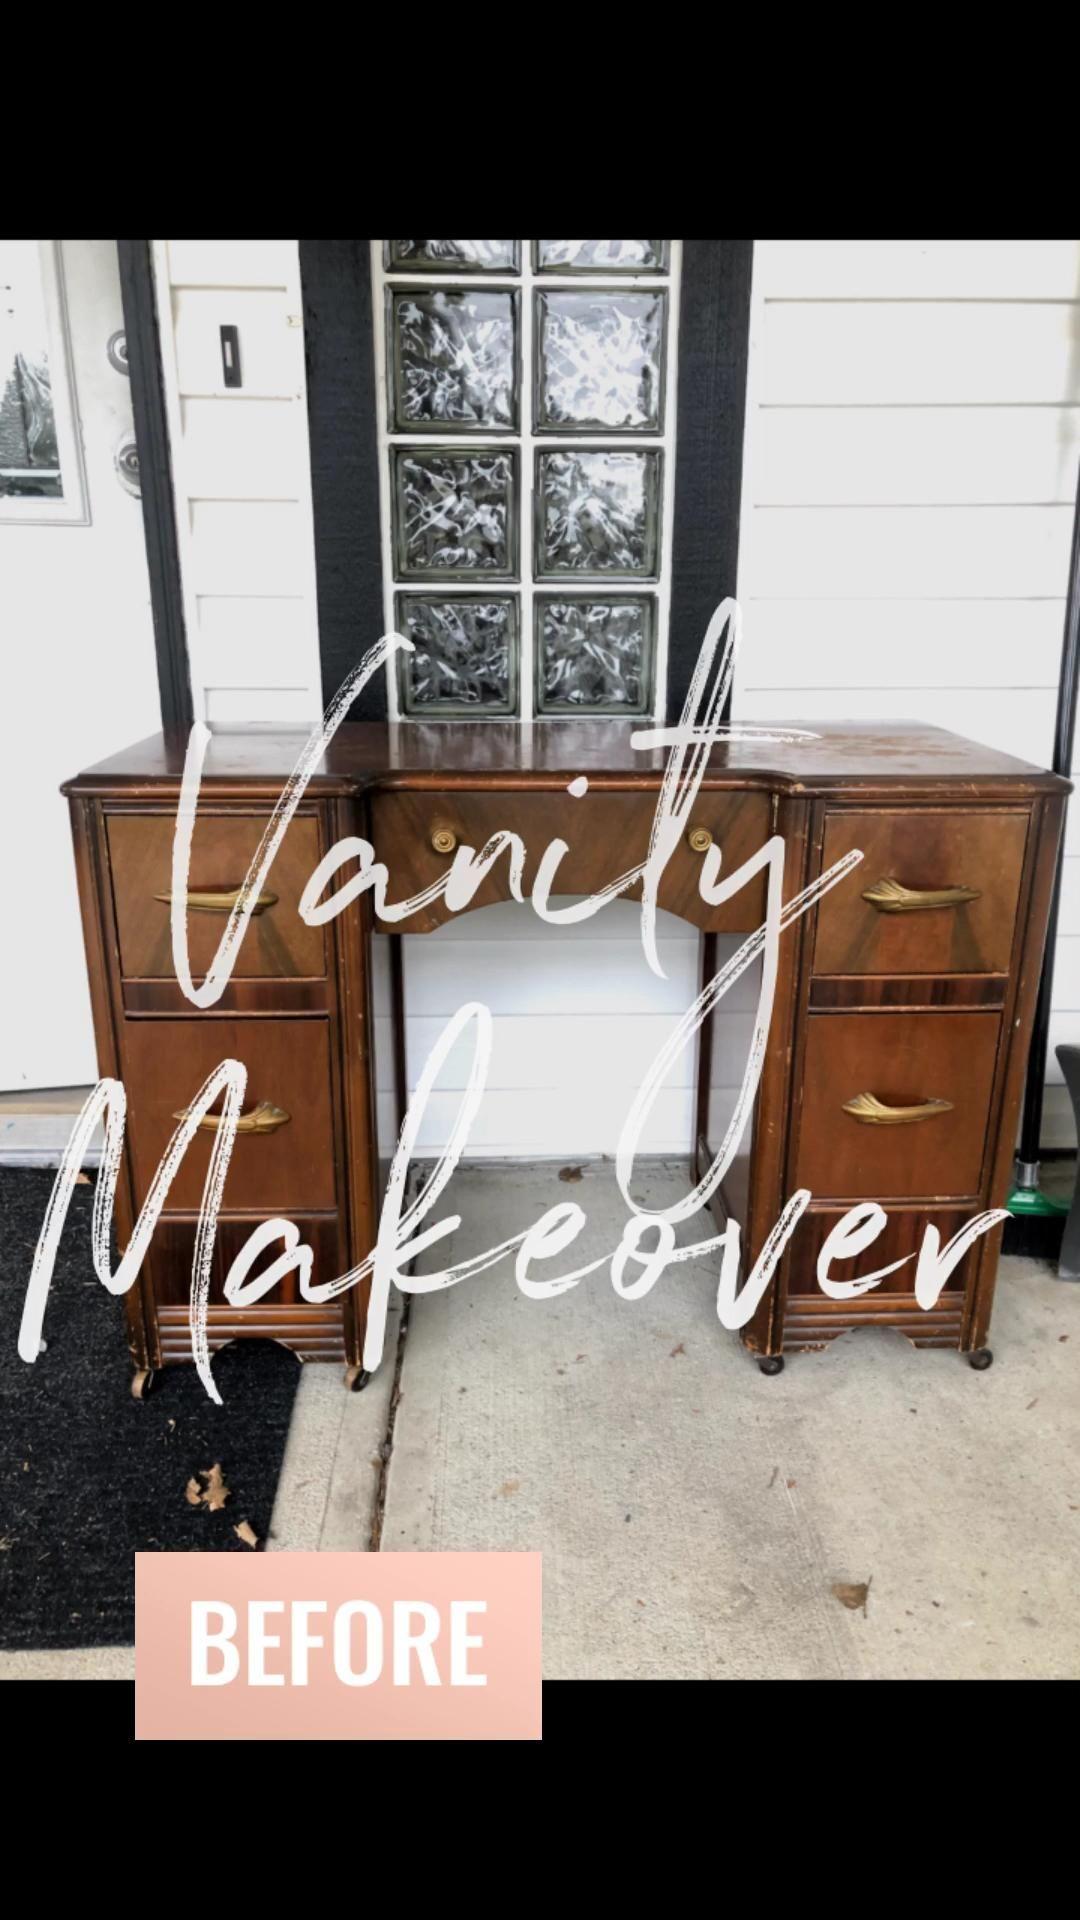 This vanity needed a new facelift! Amazinly built. #vanitymakeover #furnitureflip #furniturediy #diydesign #desinger #painter #chalkpaint #diylife #furniturerefinished